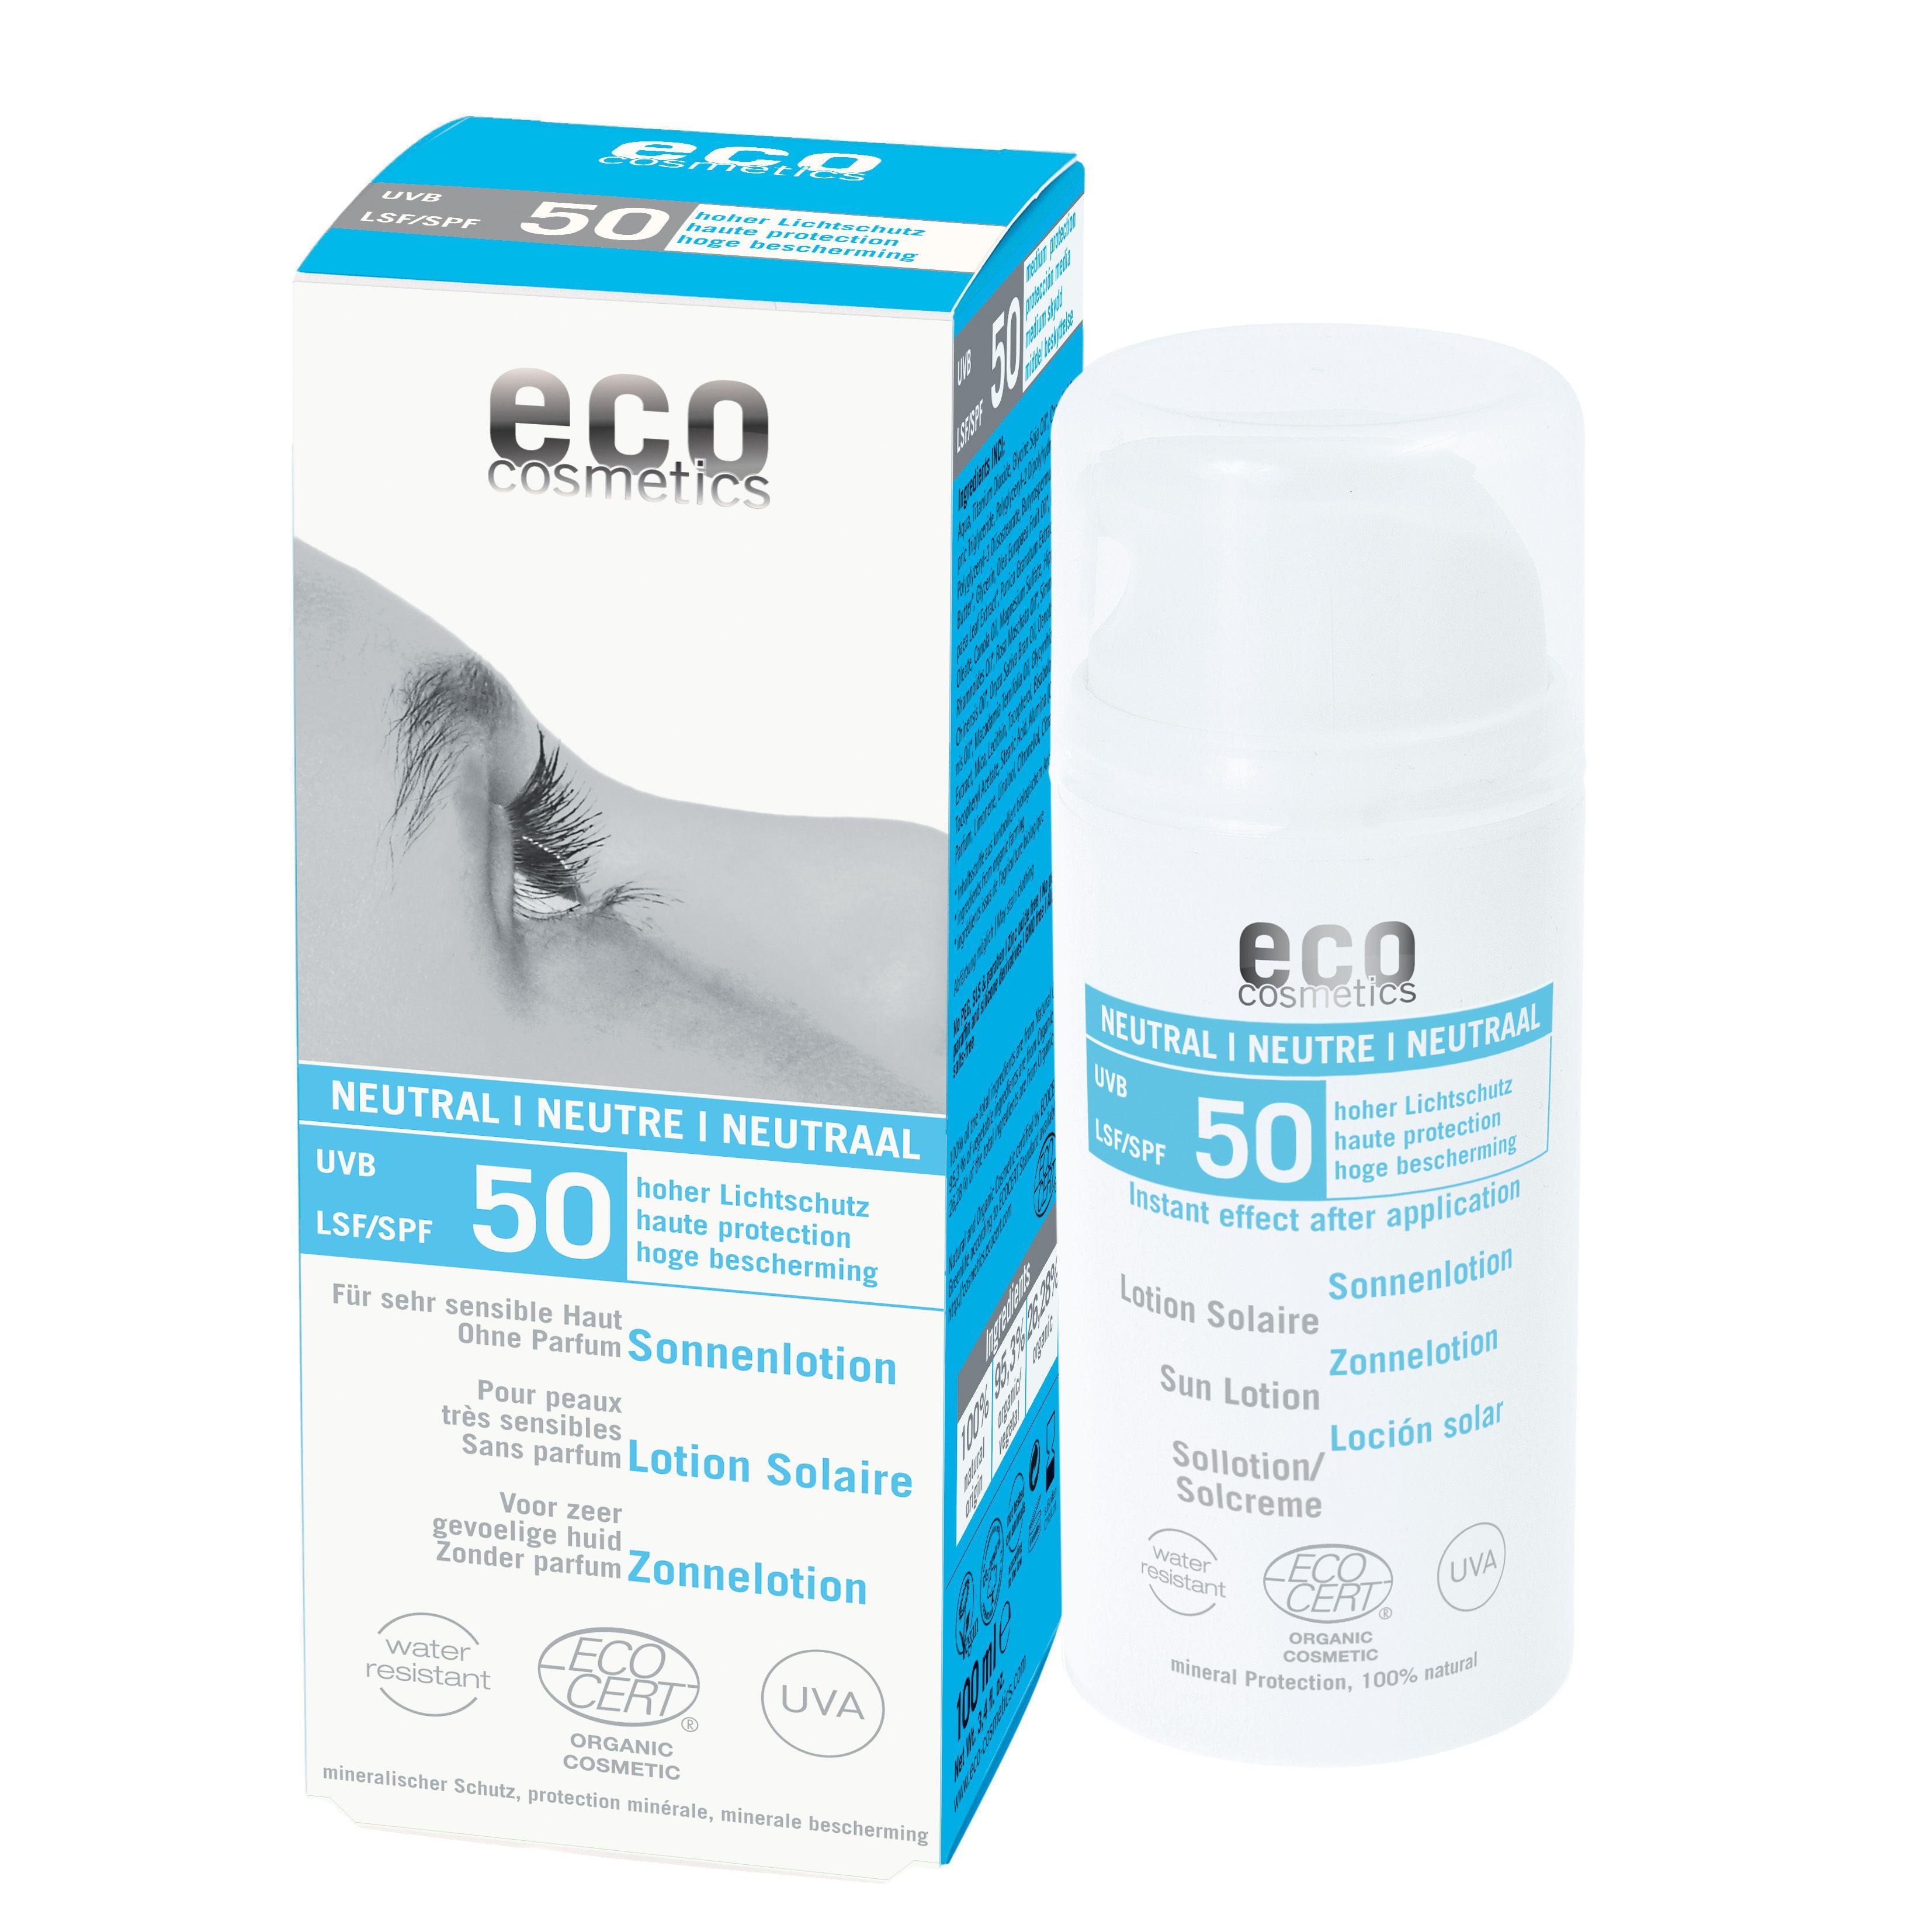 Eco Sun Lotion Neutral Spf 50 Without Perfum Eco Cosmetics Lotion Sonnenschutzmittel Lichtschutzfaktor